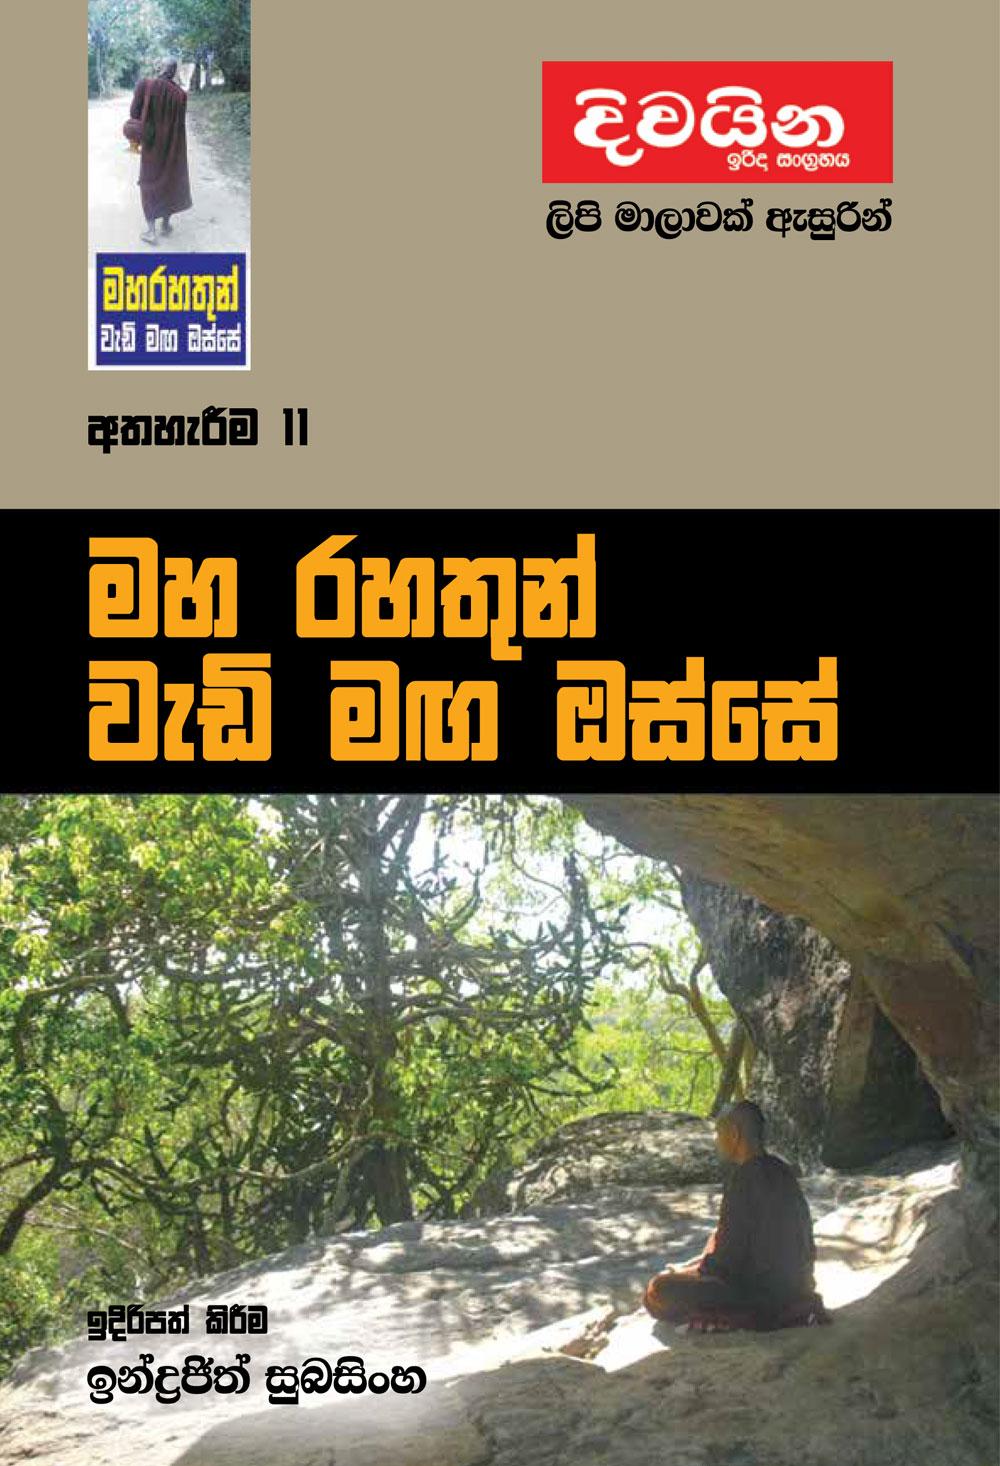 Maha Rahathun Wadi Maga Osse Book 11